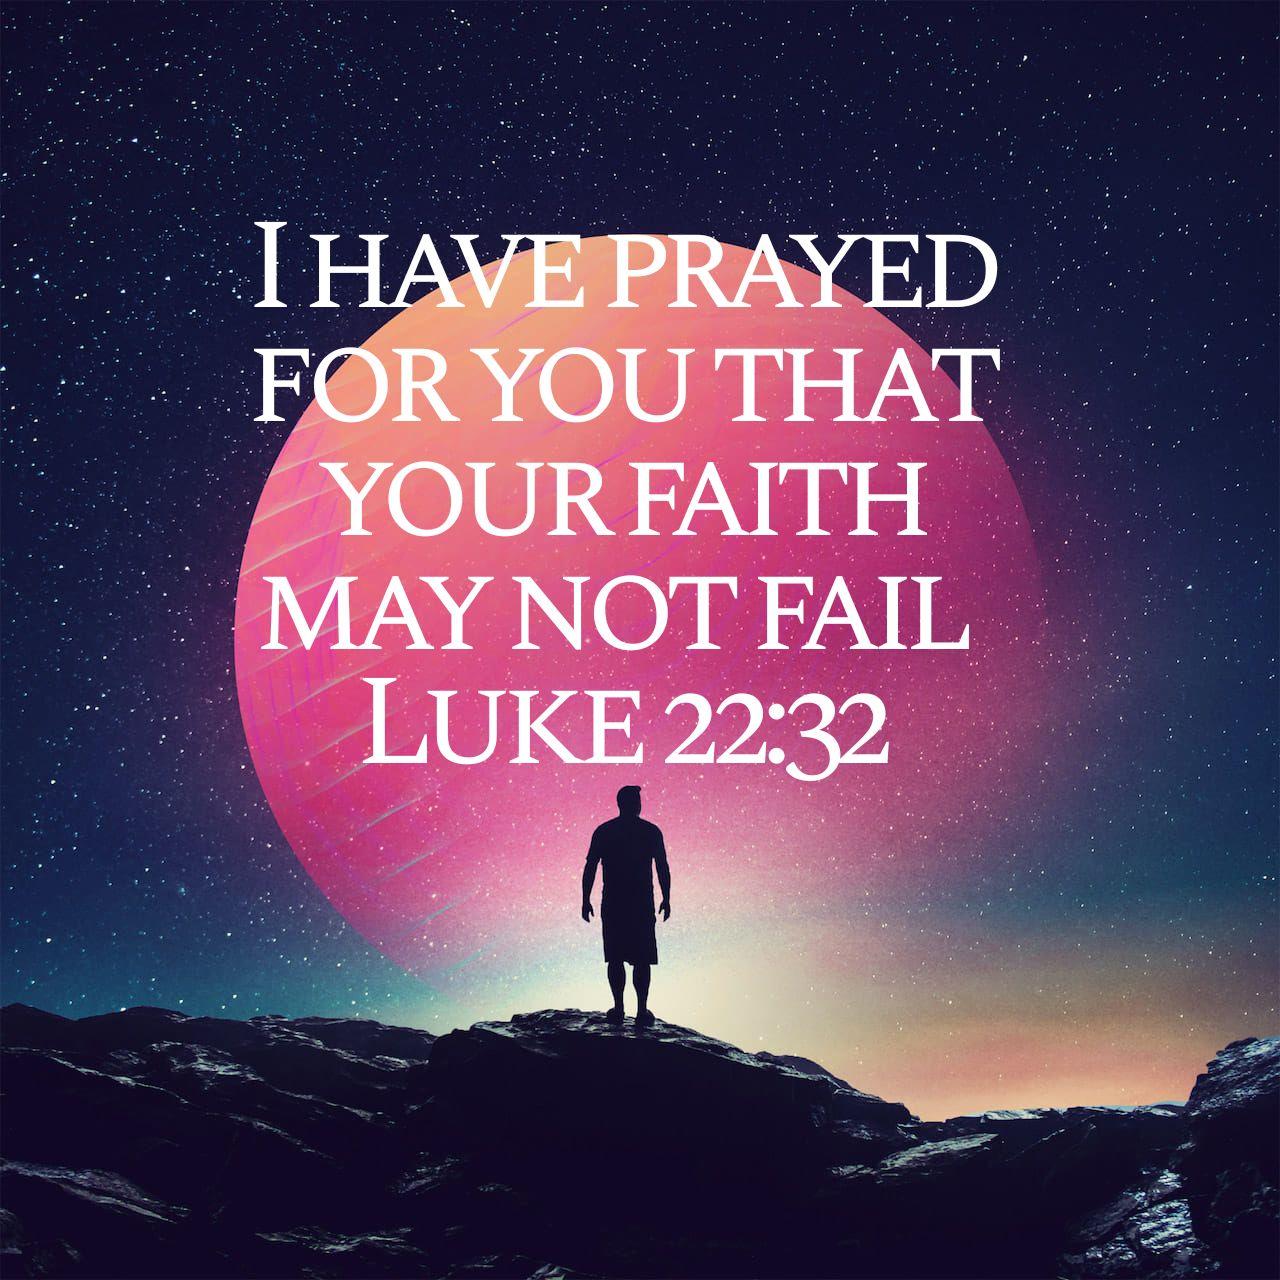 Daily Bible Reading: Luke 22:31-53